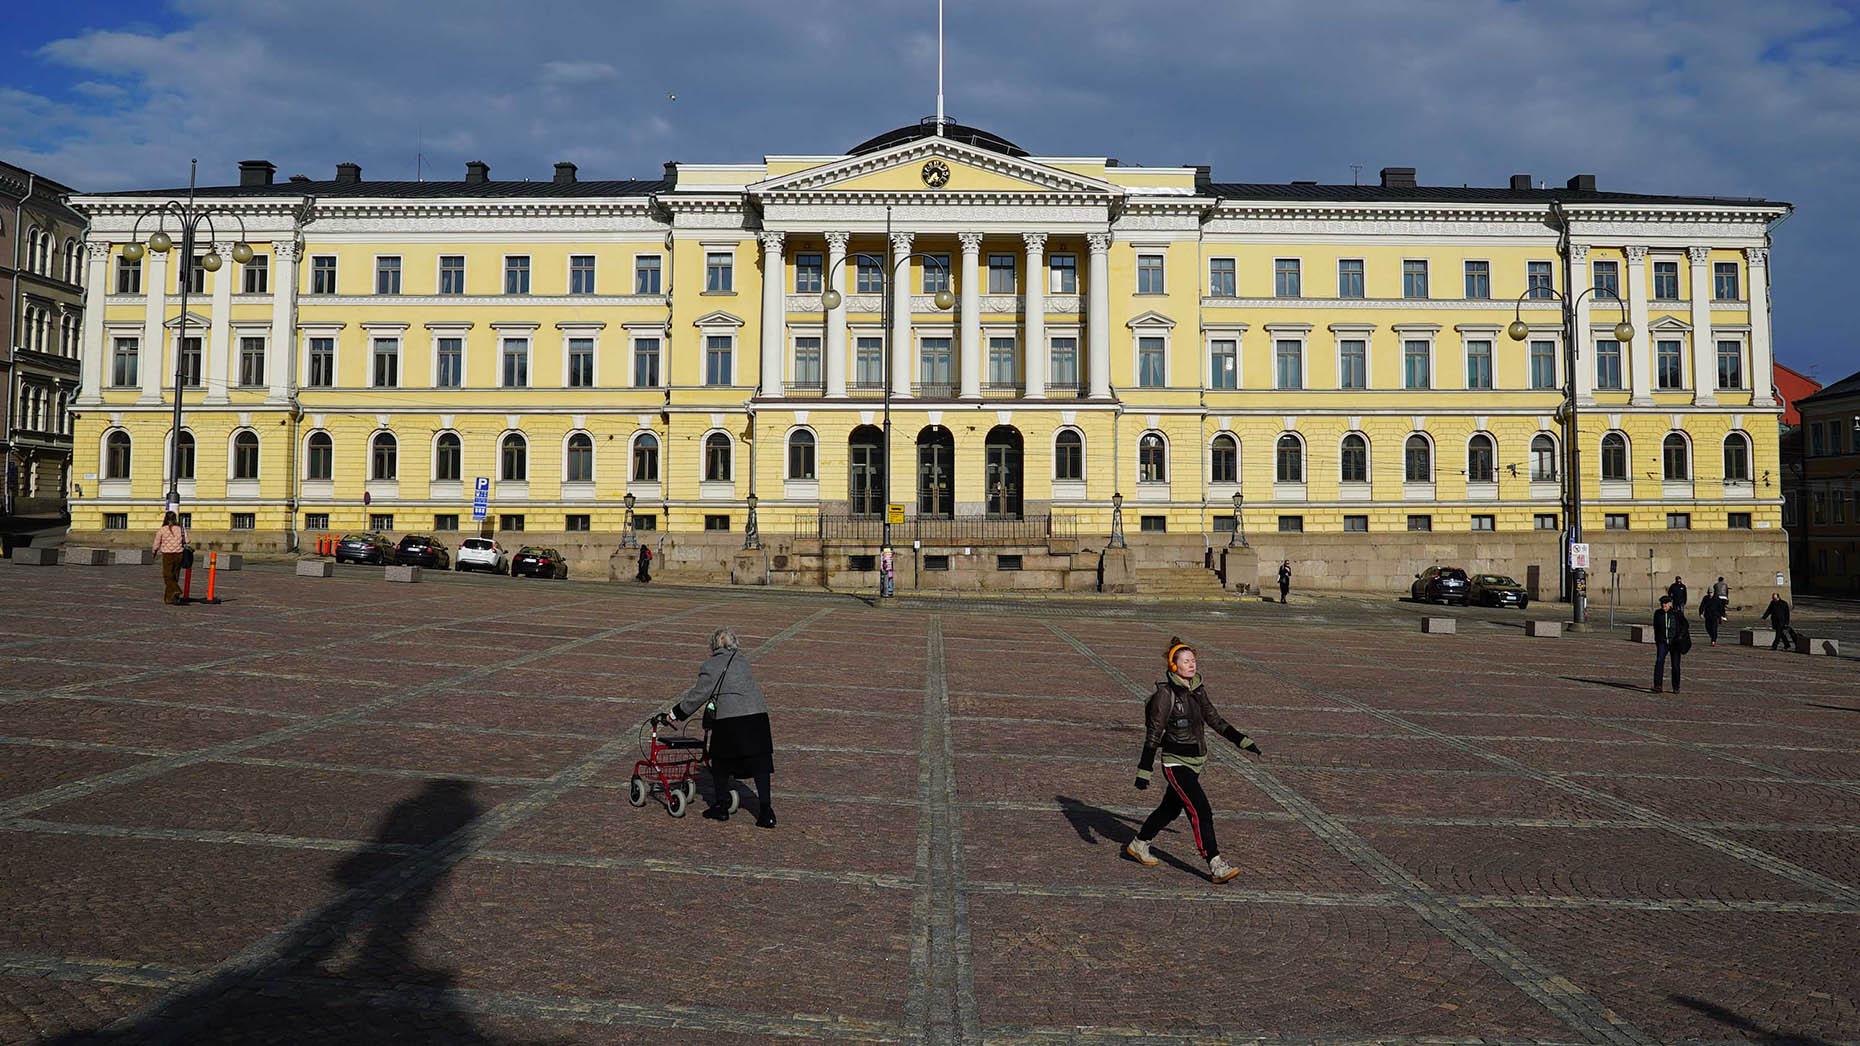 The Finnish Parliament